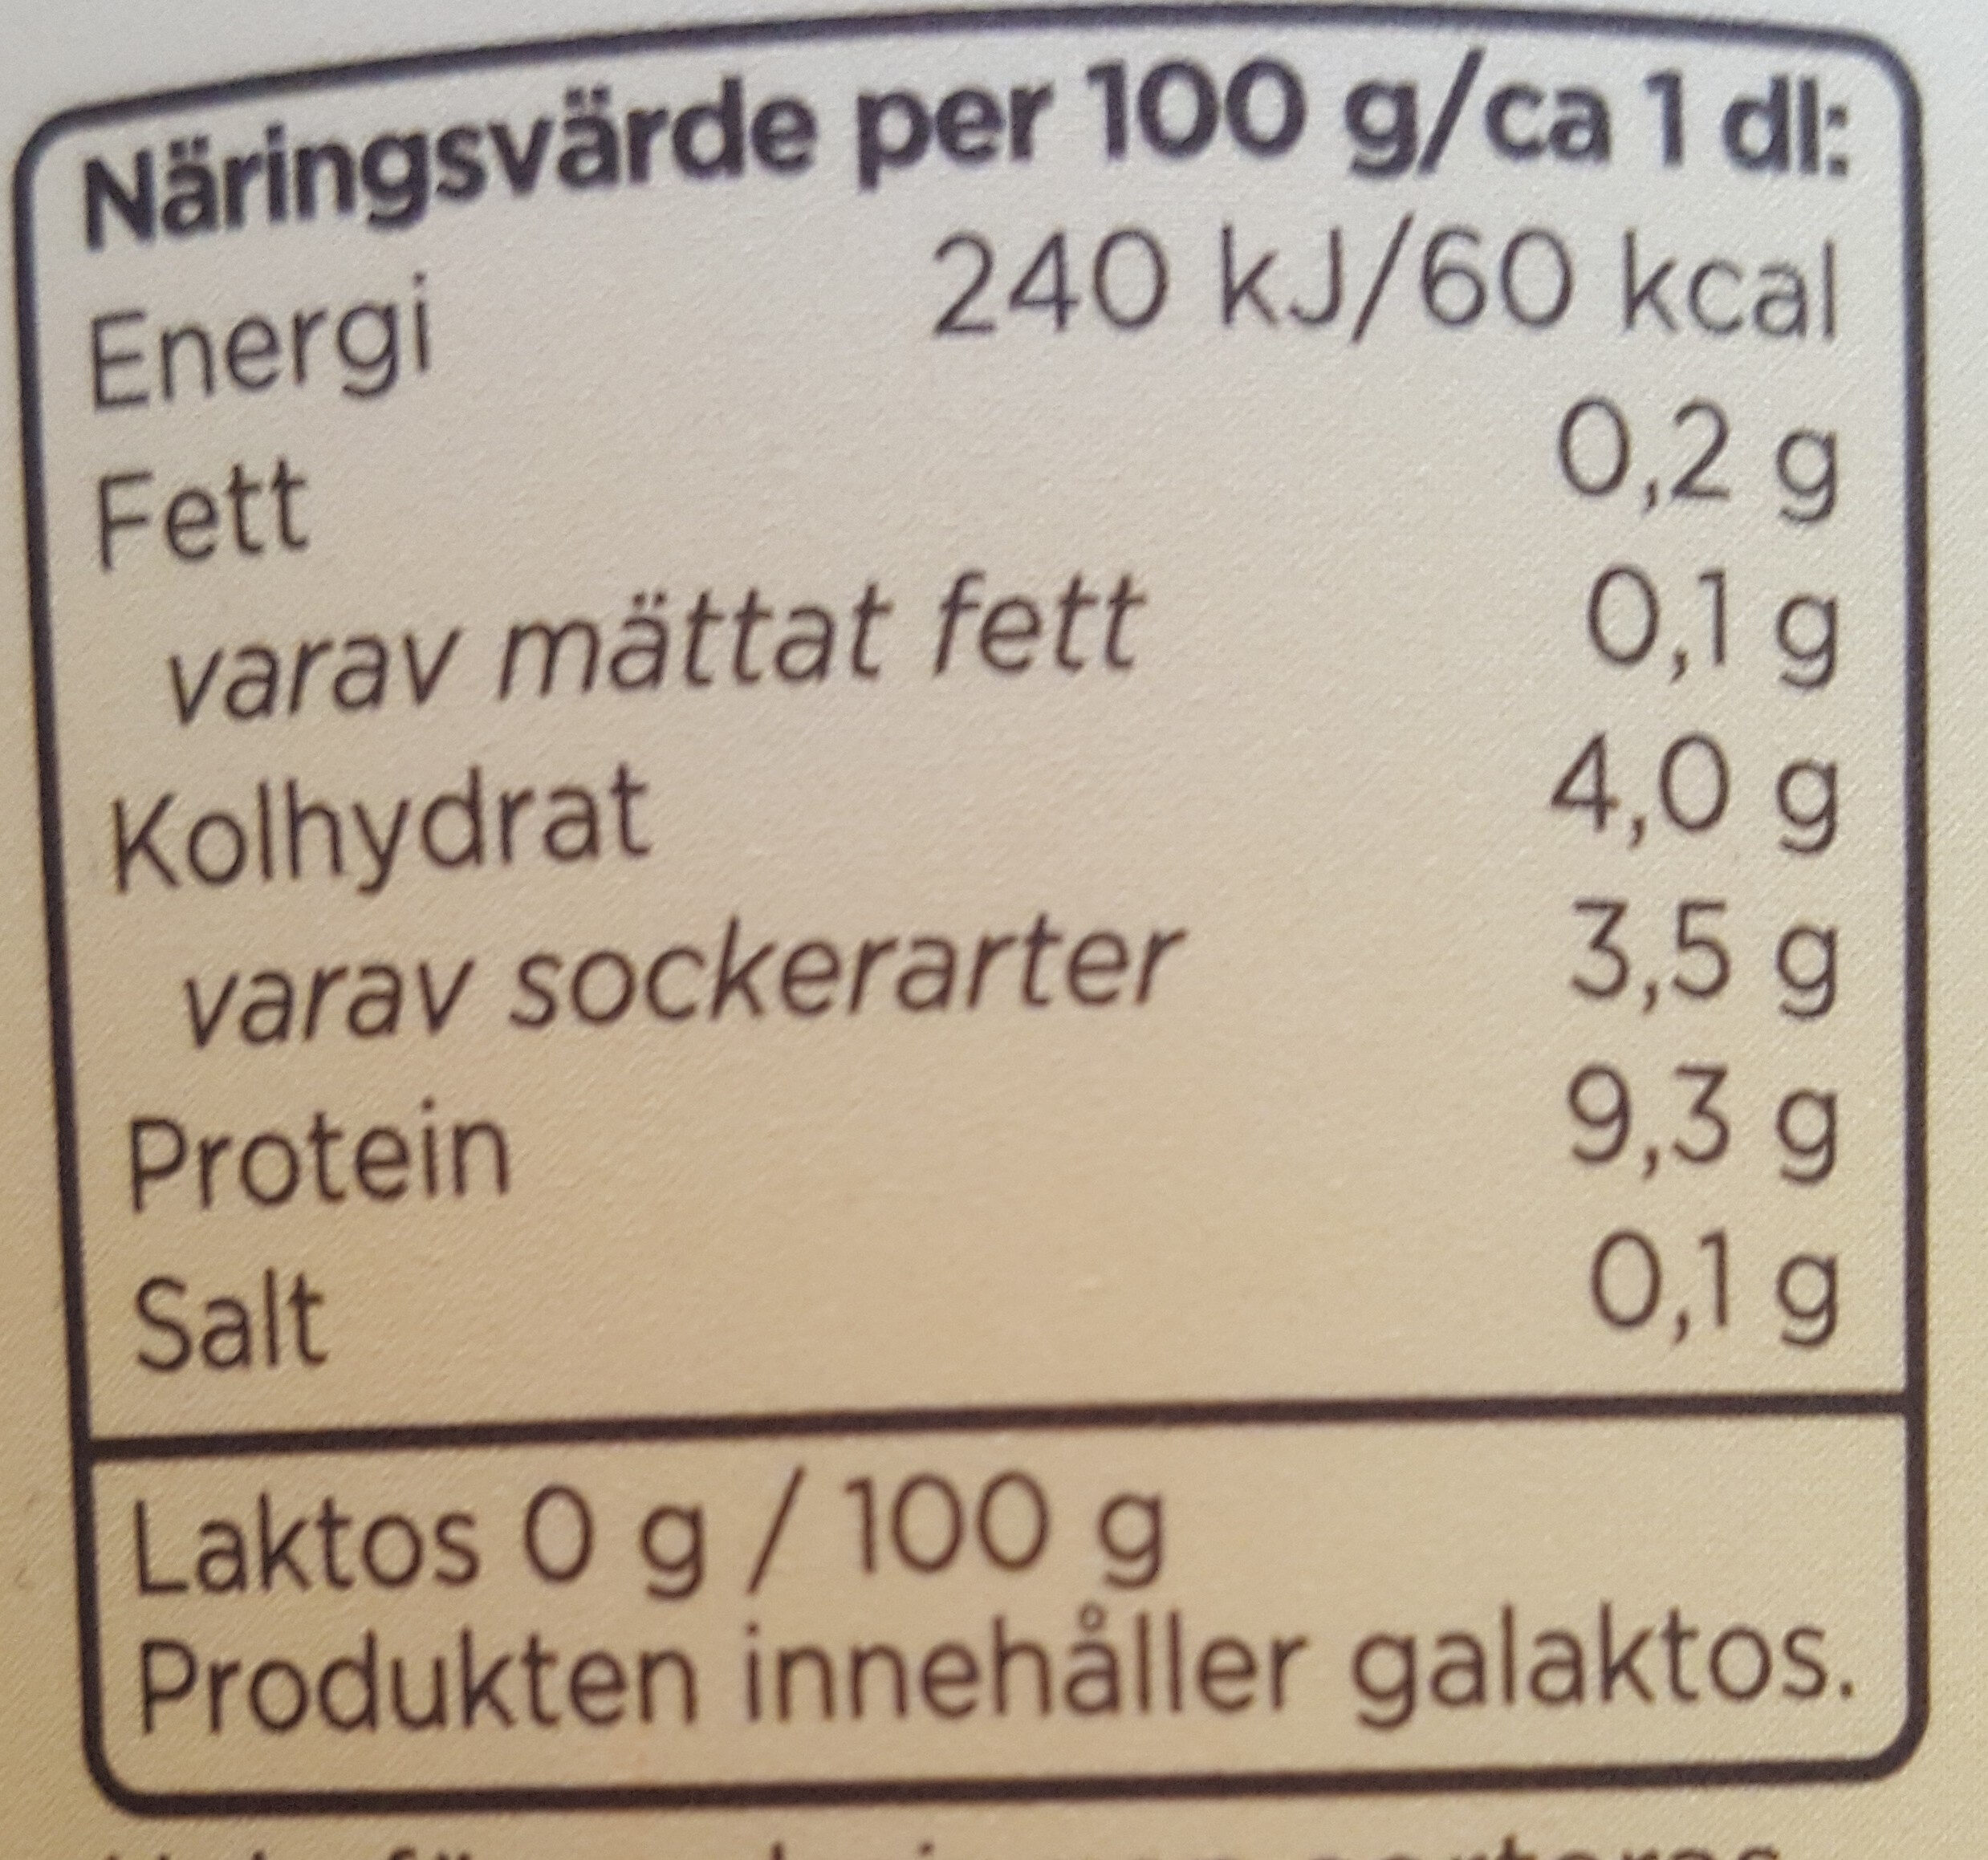 Mild kvarg vanilj - Nutrition facts